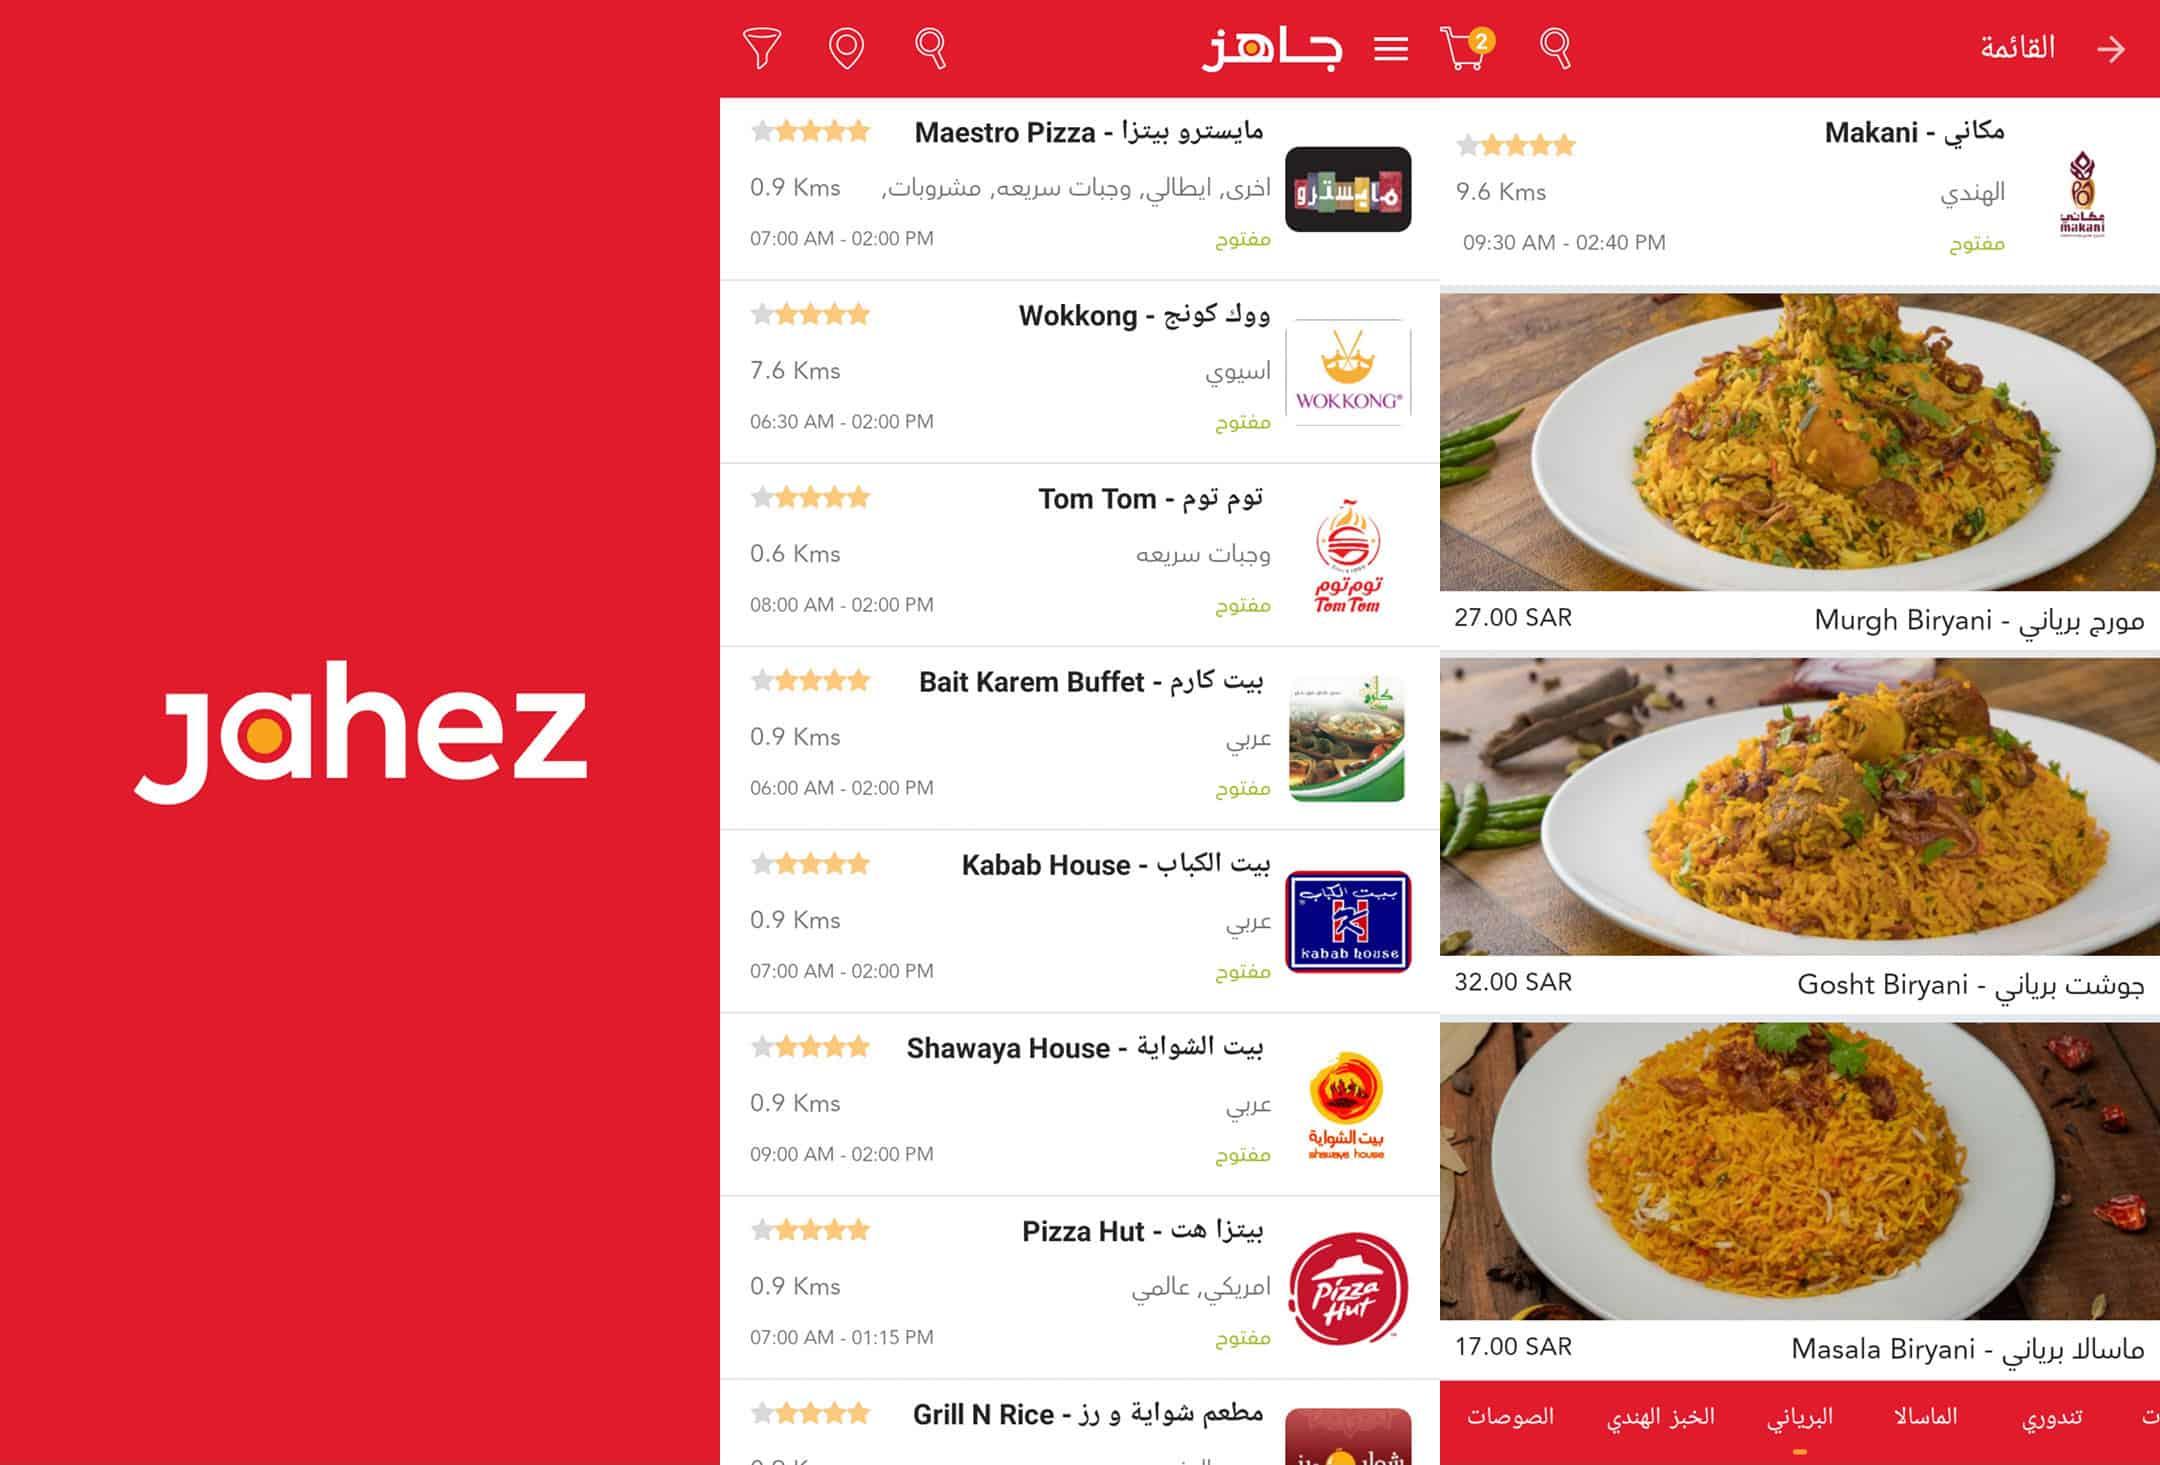 Saudi Based Jahez Raises $36 Million in Series A Funding